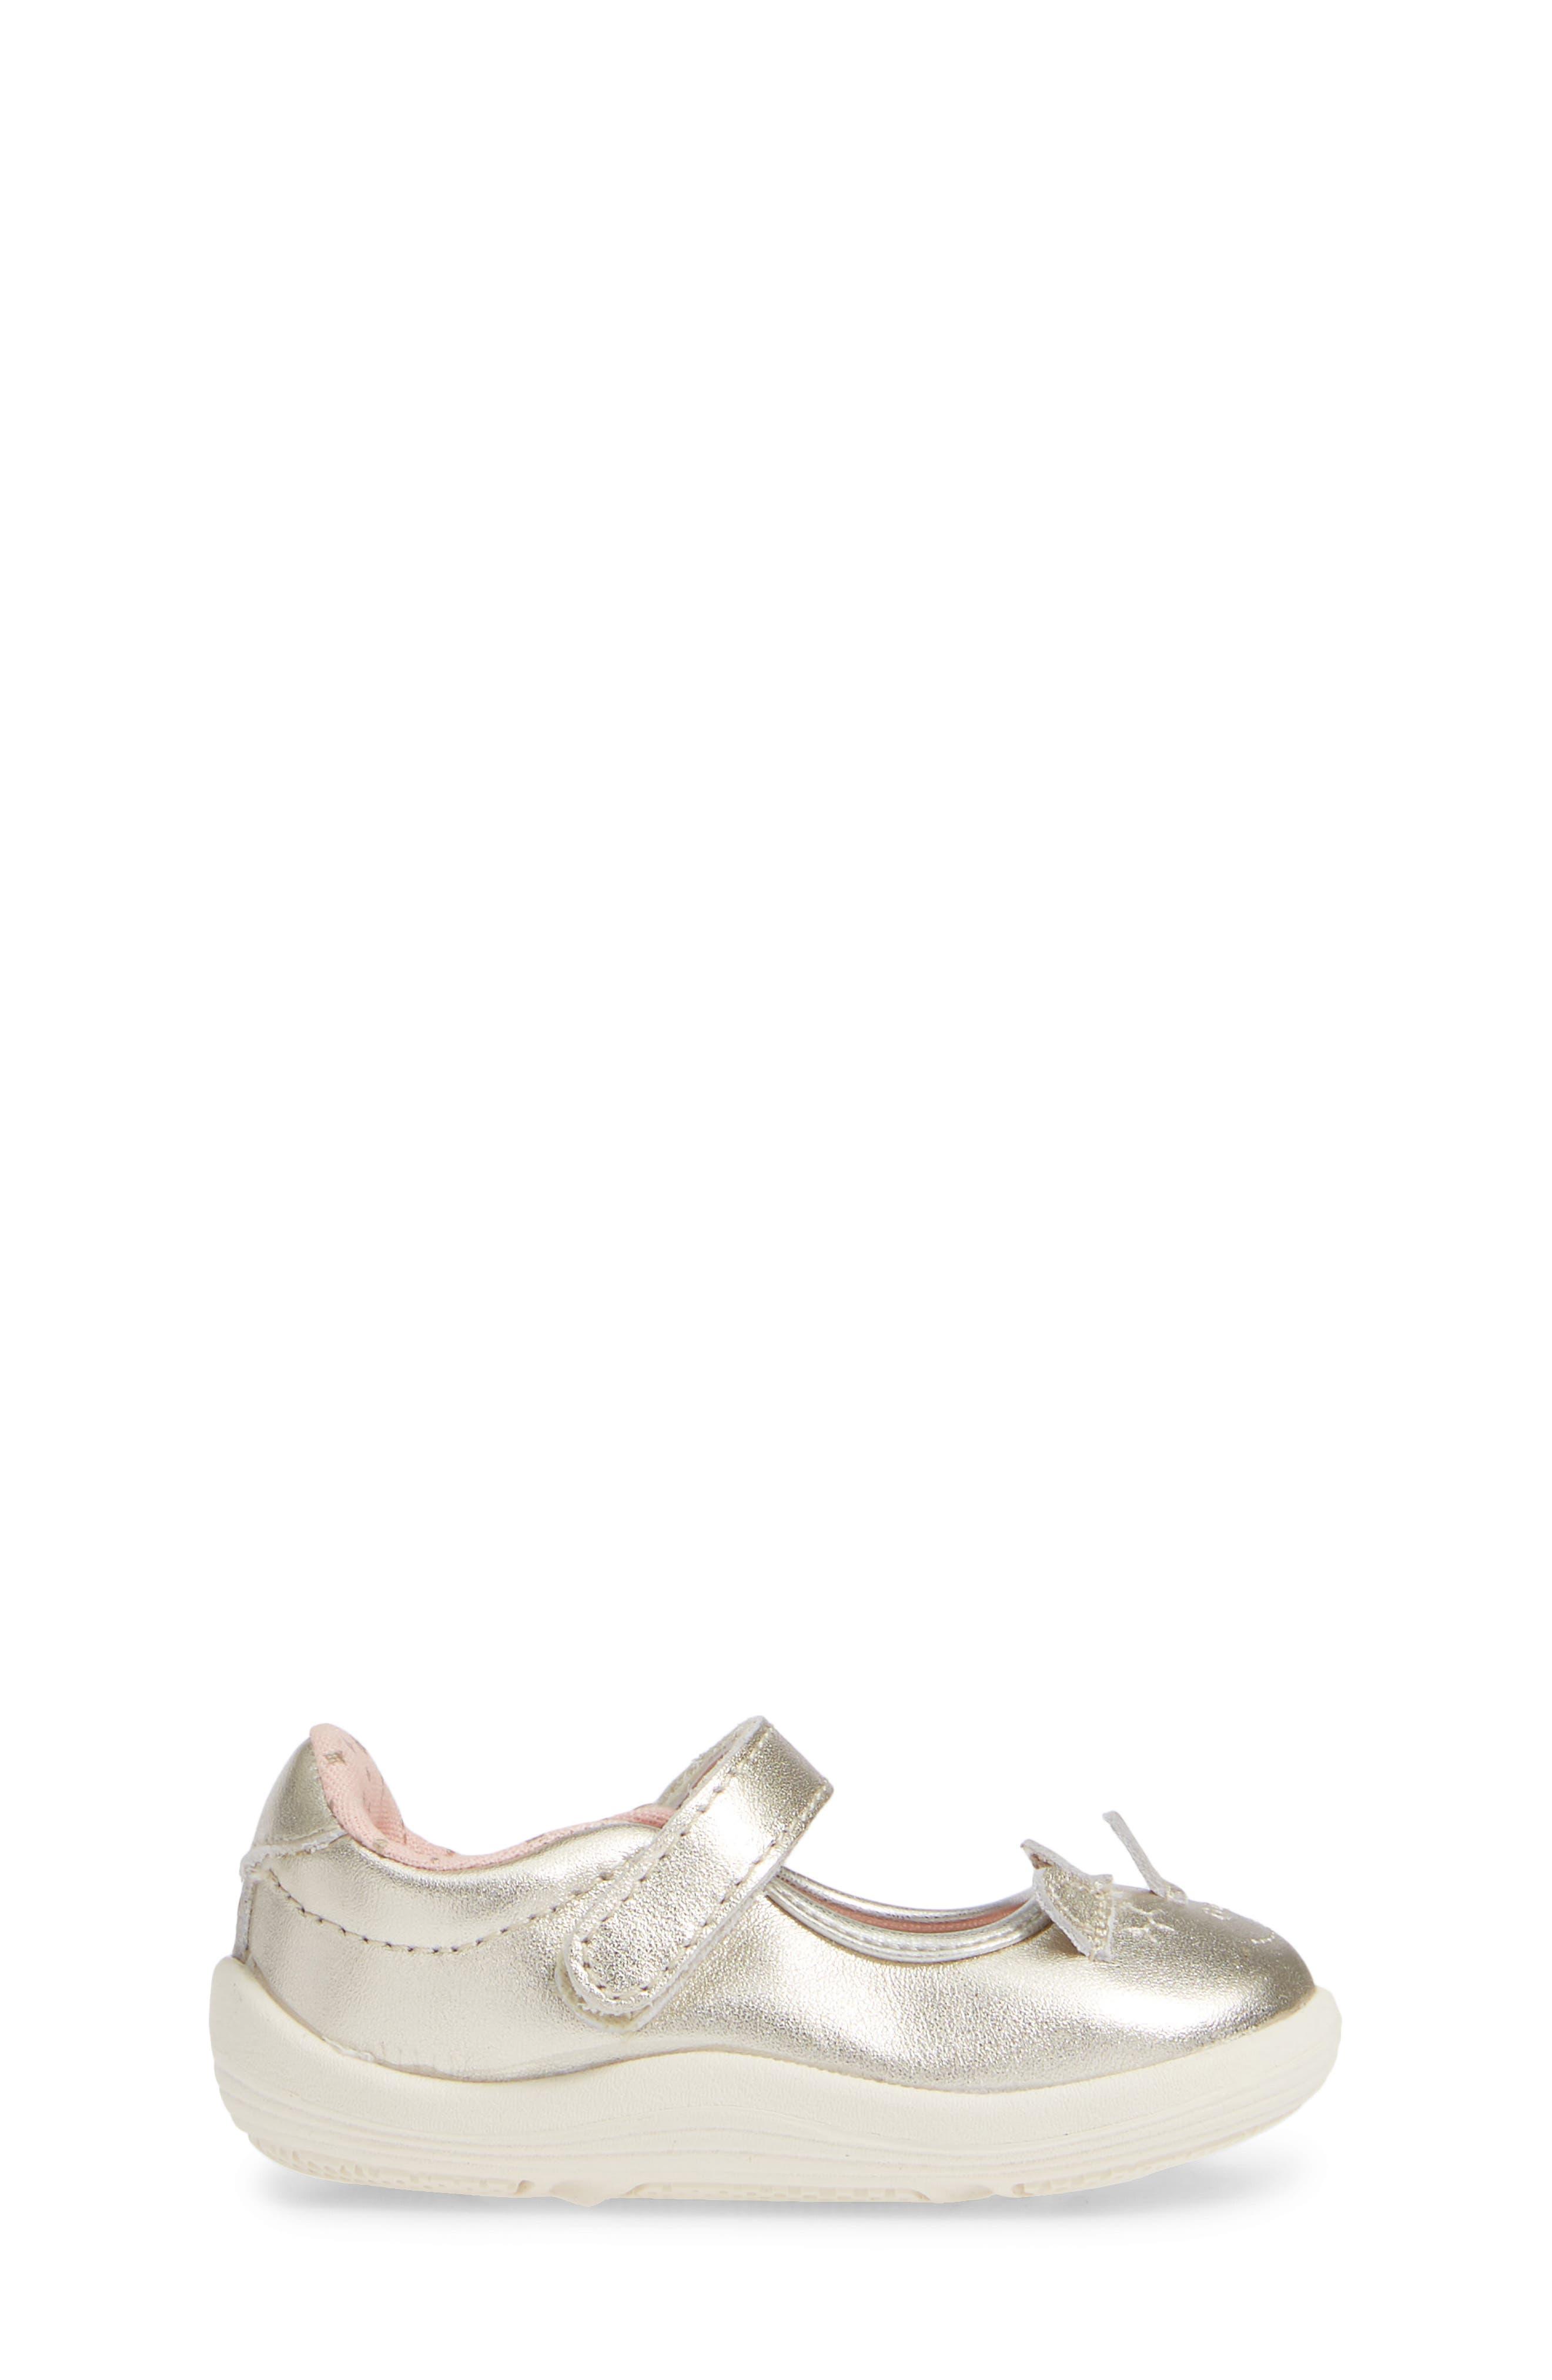 Clara Metallic Shoe,                             Alternate thumbnail 3, color,                             GOLD LEATHER